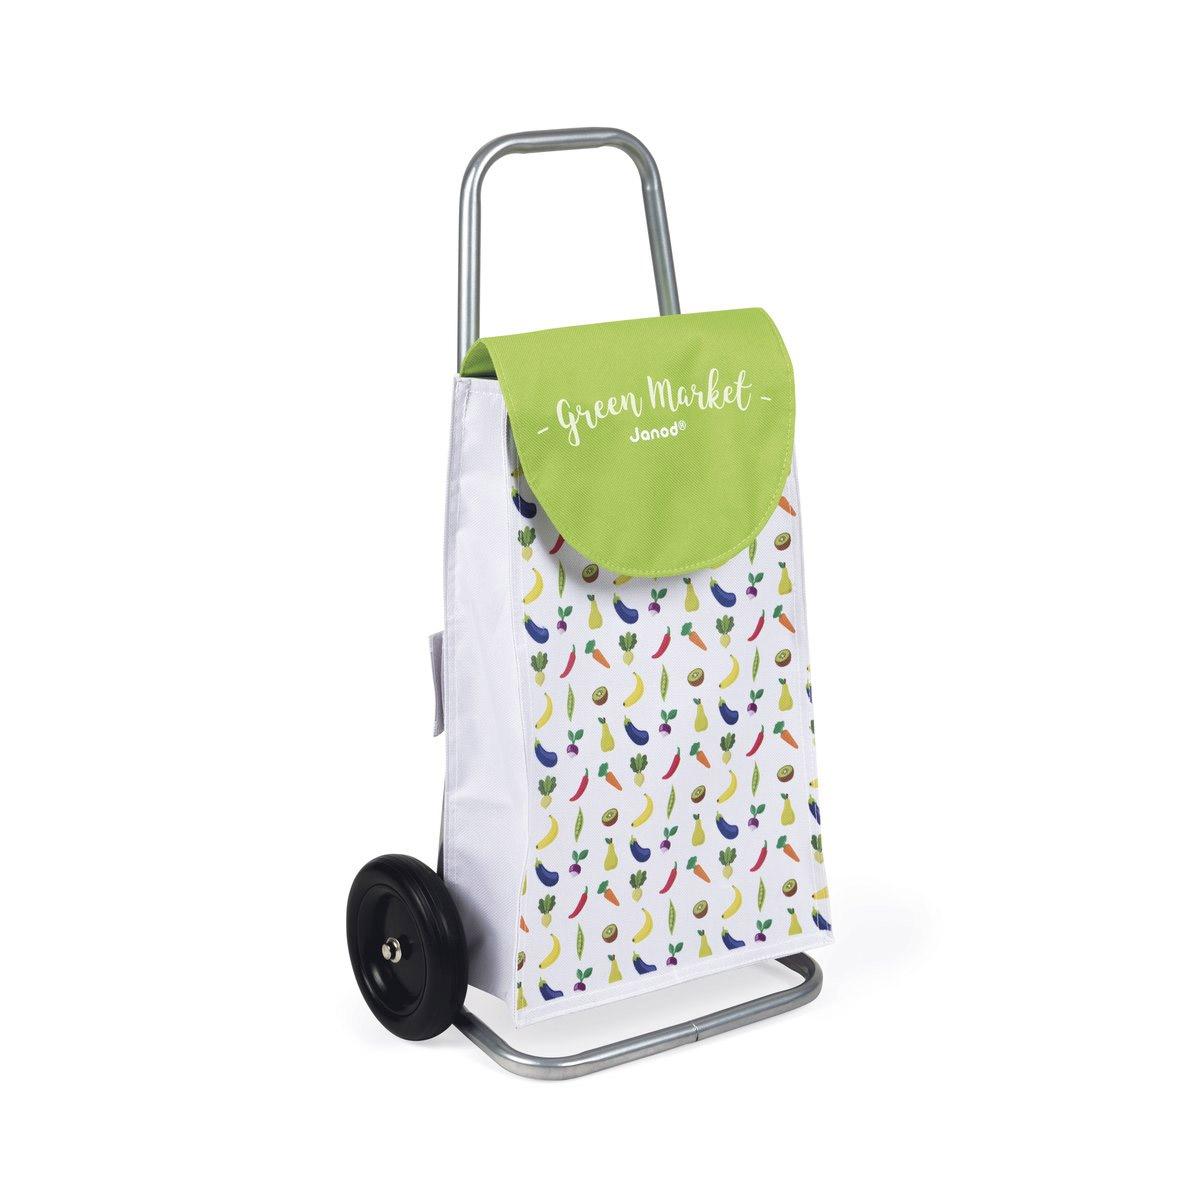 Chariot de course - Green Market